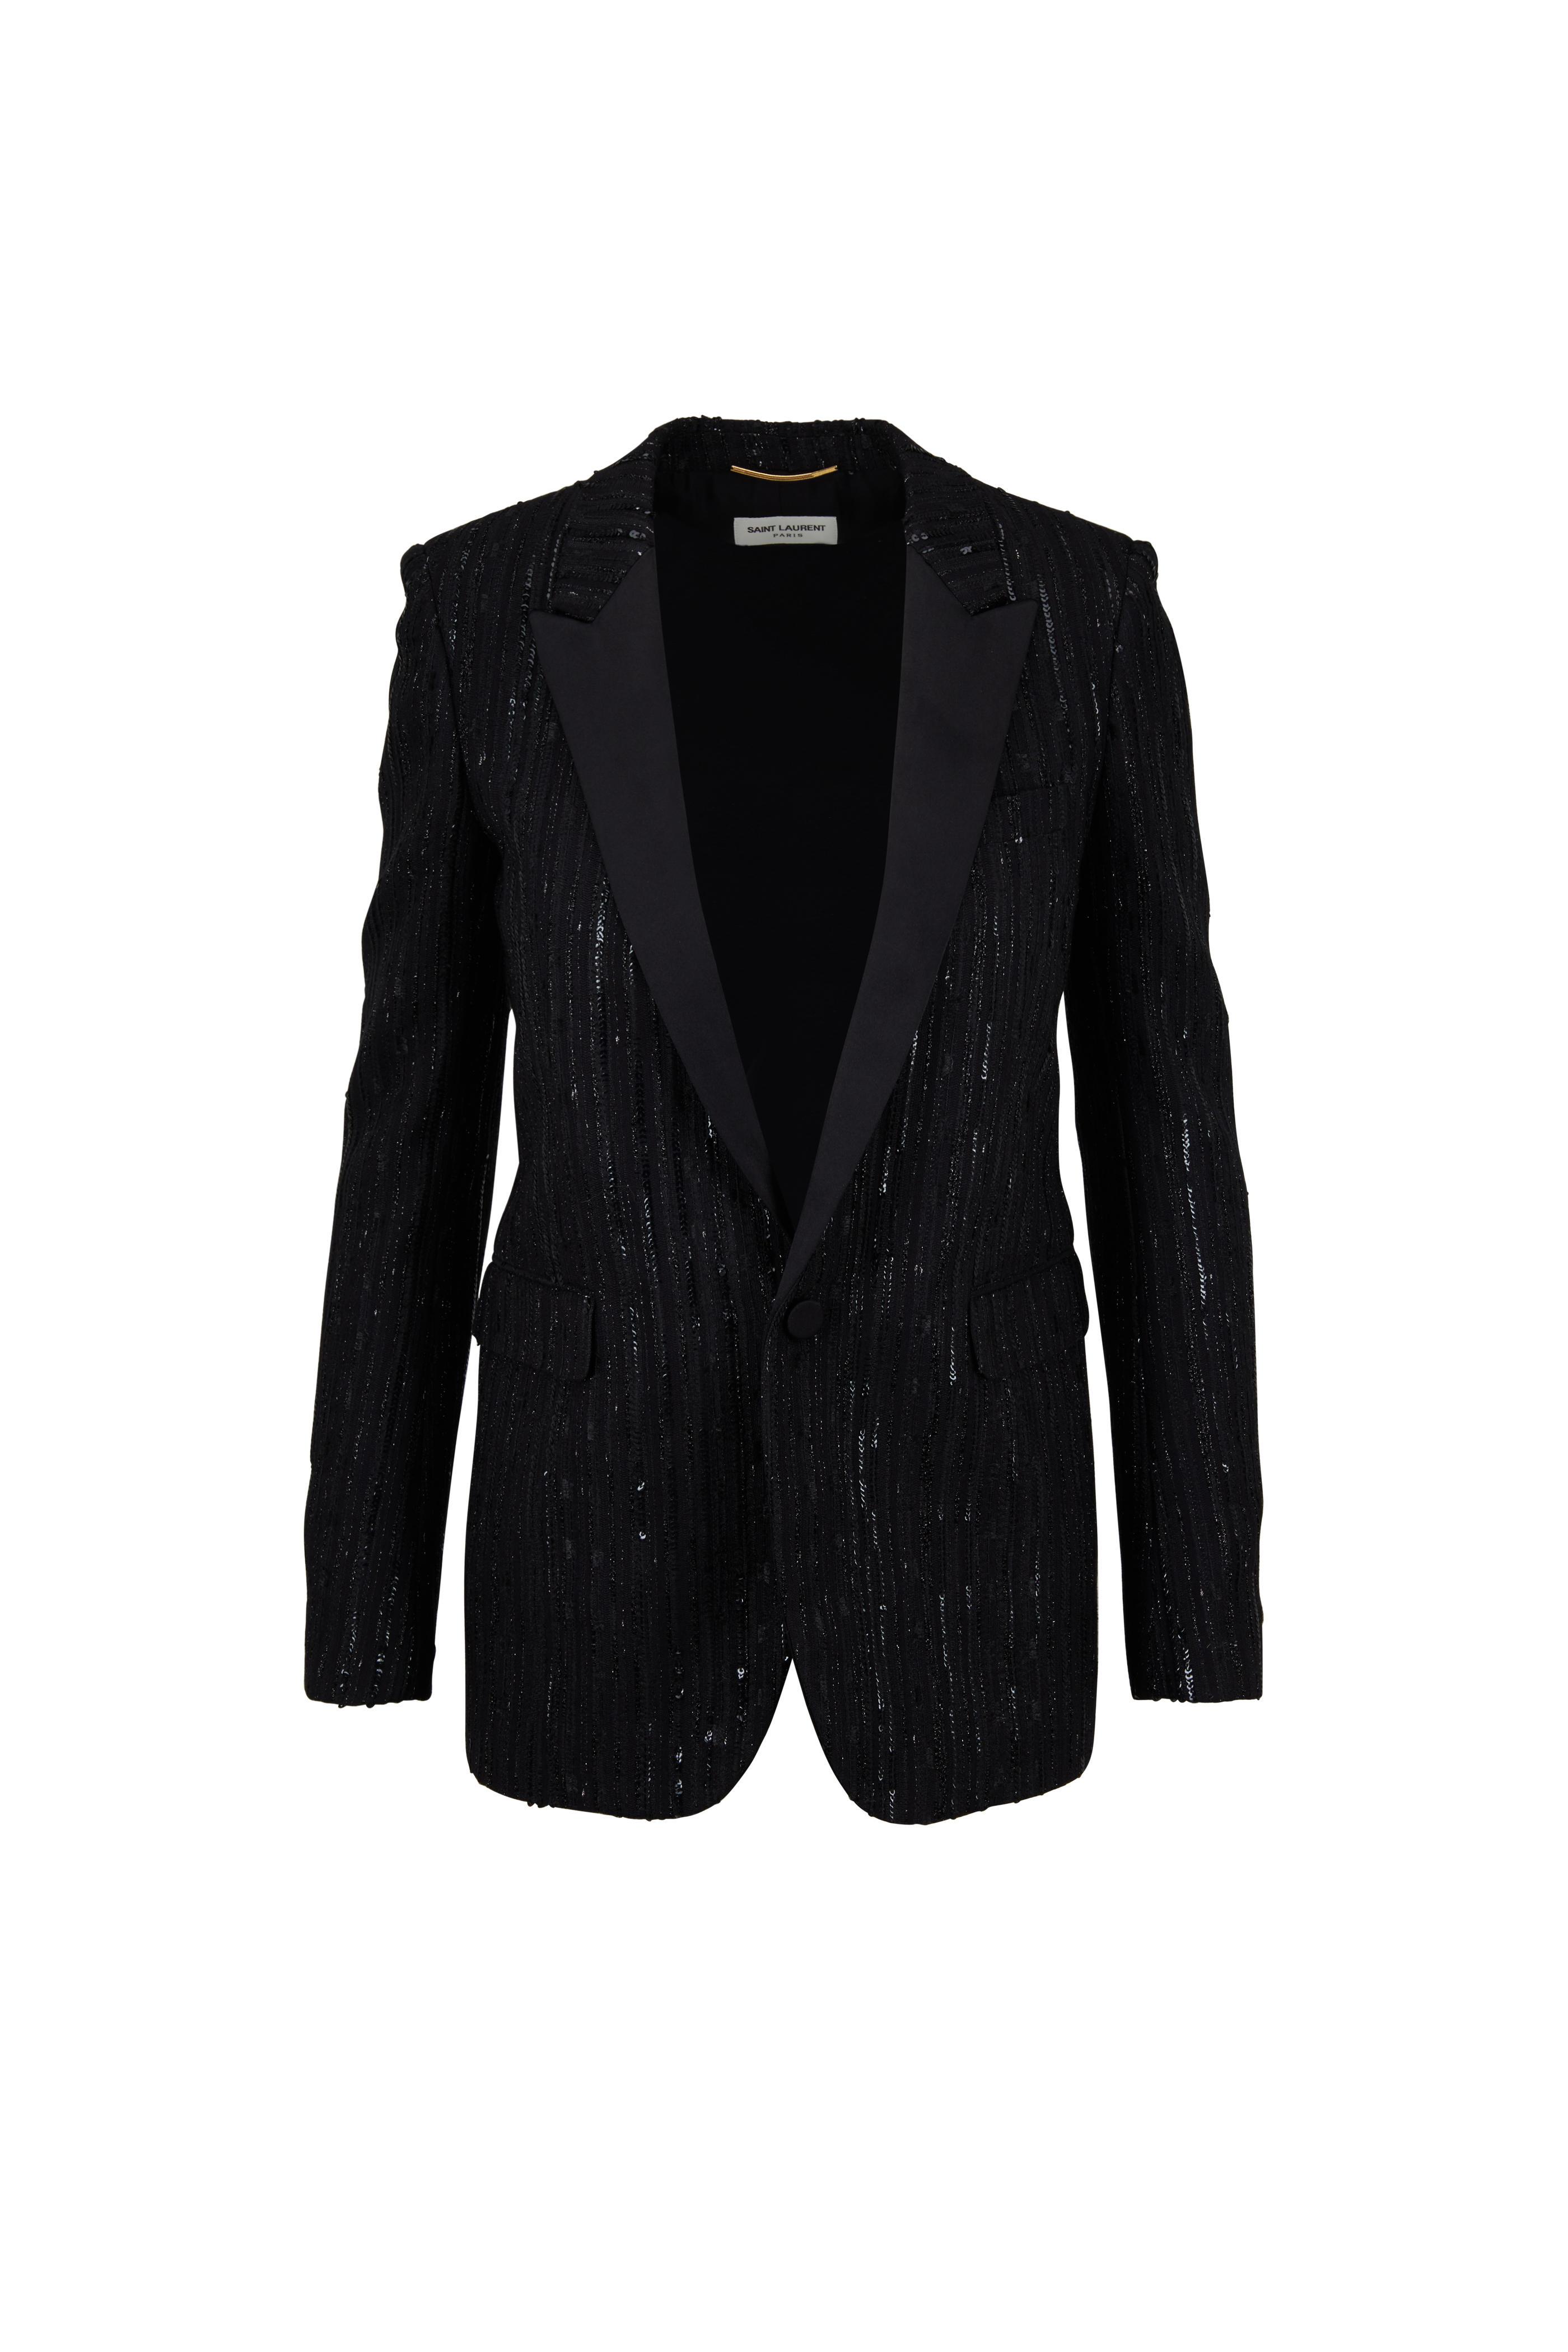 1dc496ee345 Saint Laurent - Black Sequin Stripe Jacket | Mitchell Stores